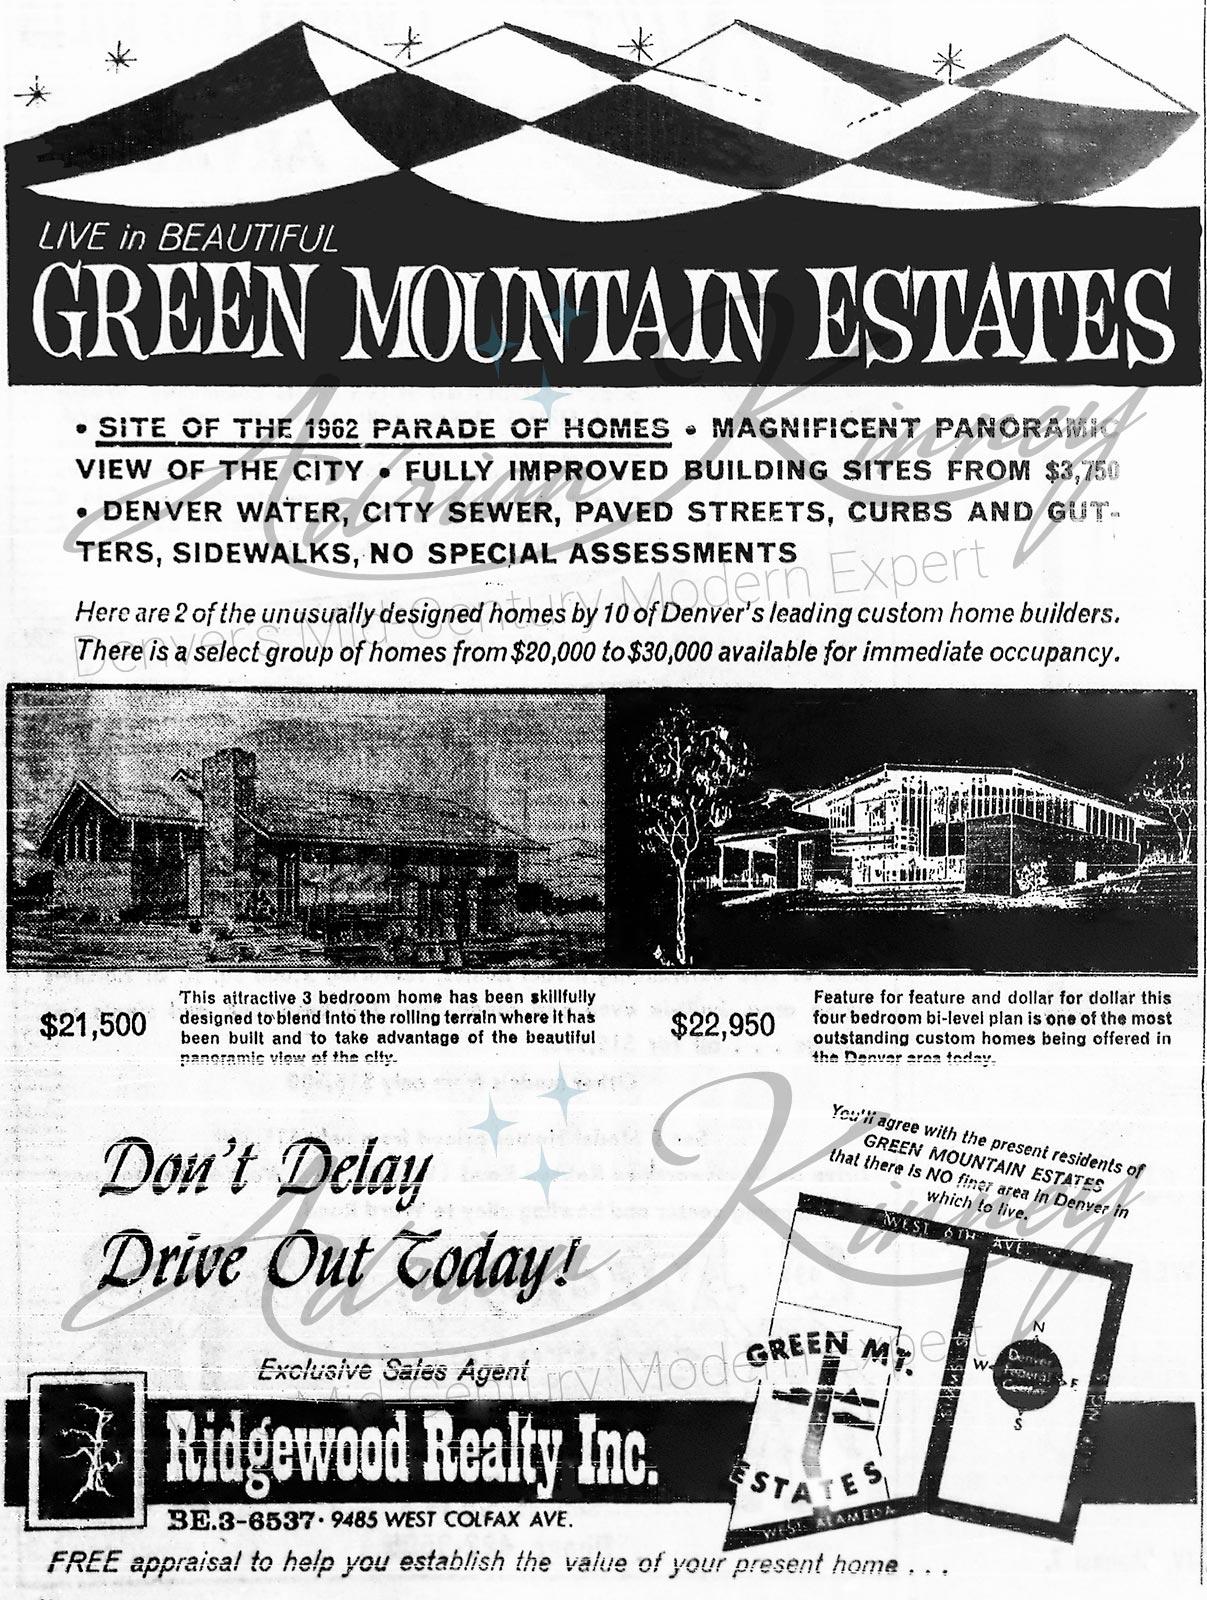 Live in Beautiful Green Mountain Estates.